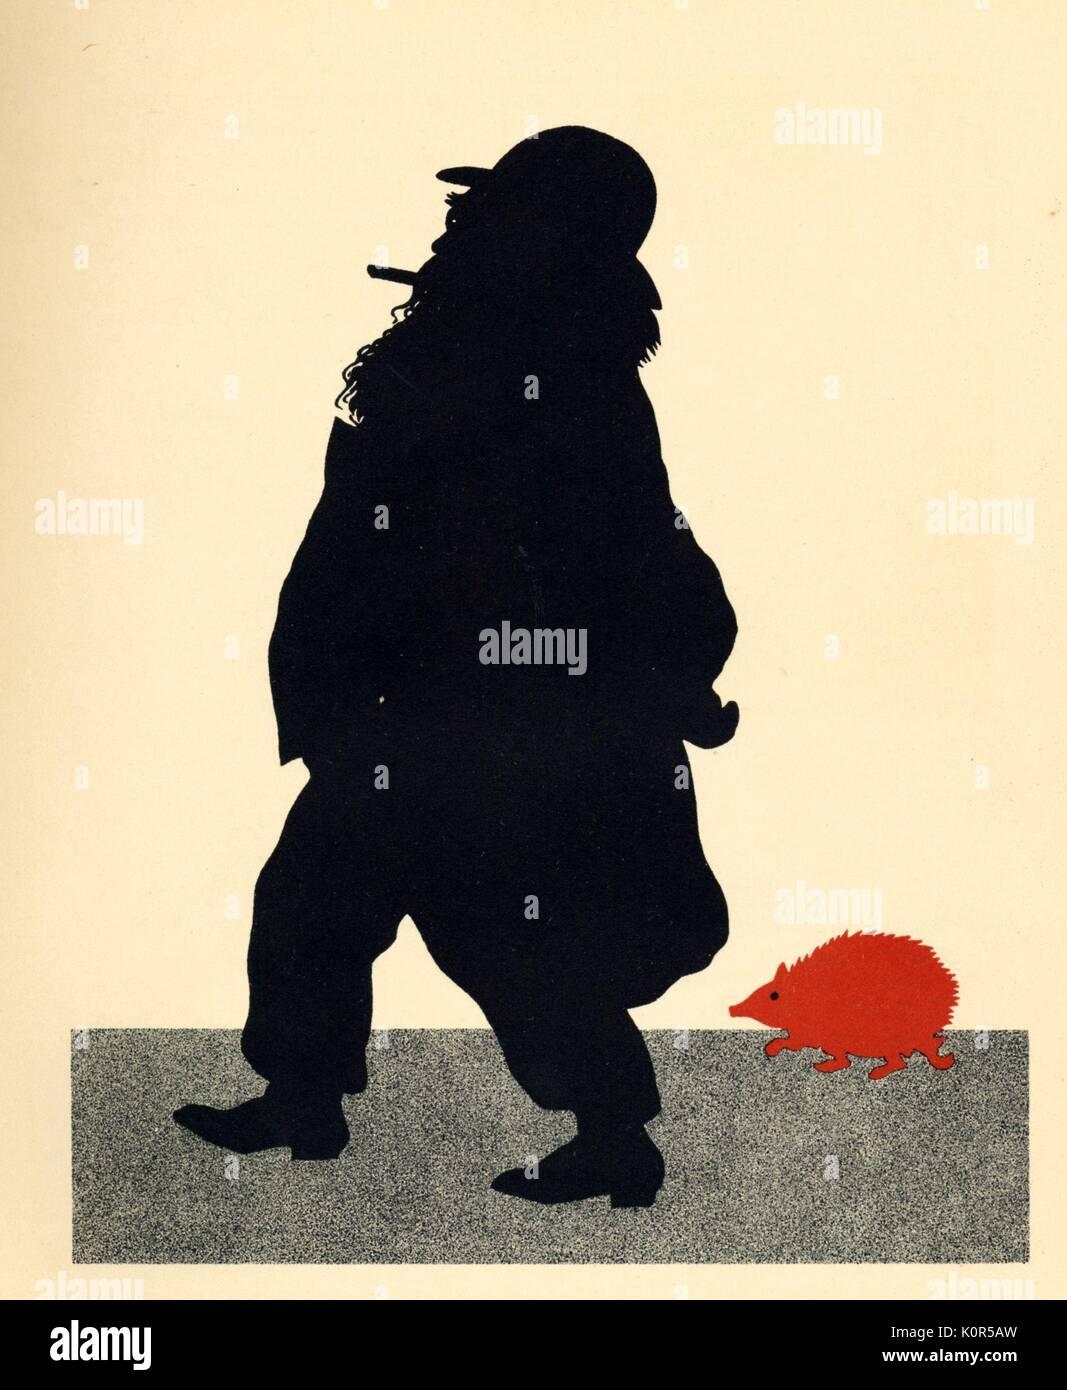 Johannes Brahms & the Red Hedgehog. On the way to the Red Hedgehog by Otto Bohler/ Boehler. 'Johannes Brahms auf dem Wege zum 'roten Igel'. German composer, 7 May 1833 - 3 April 1897. - Stock Image